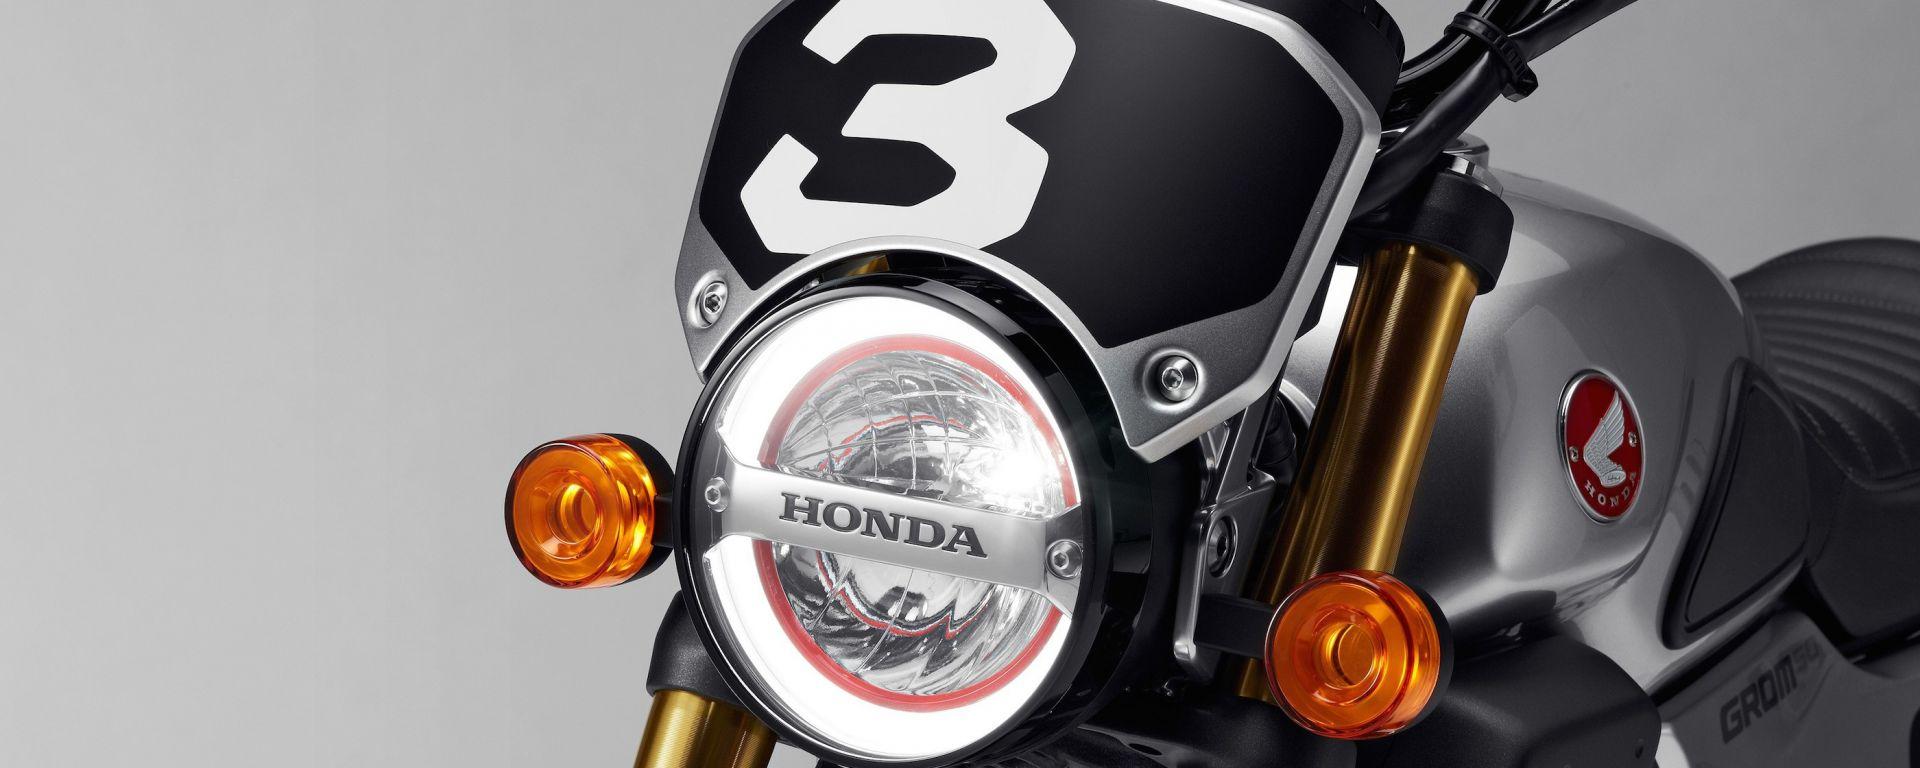 Honda Grom 50 Scrambler